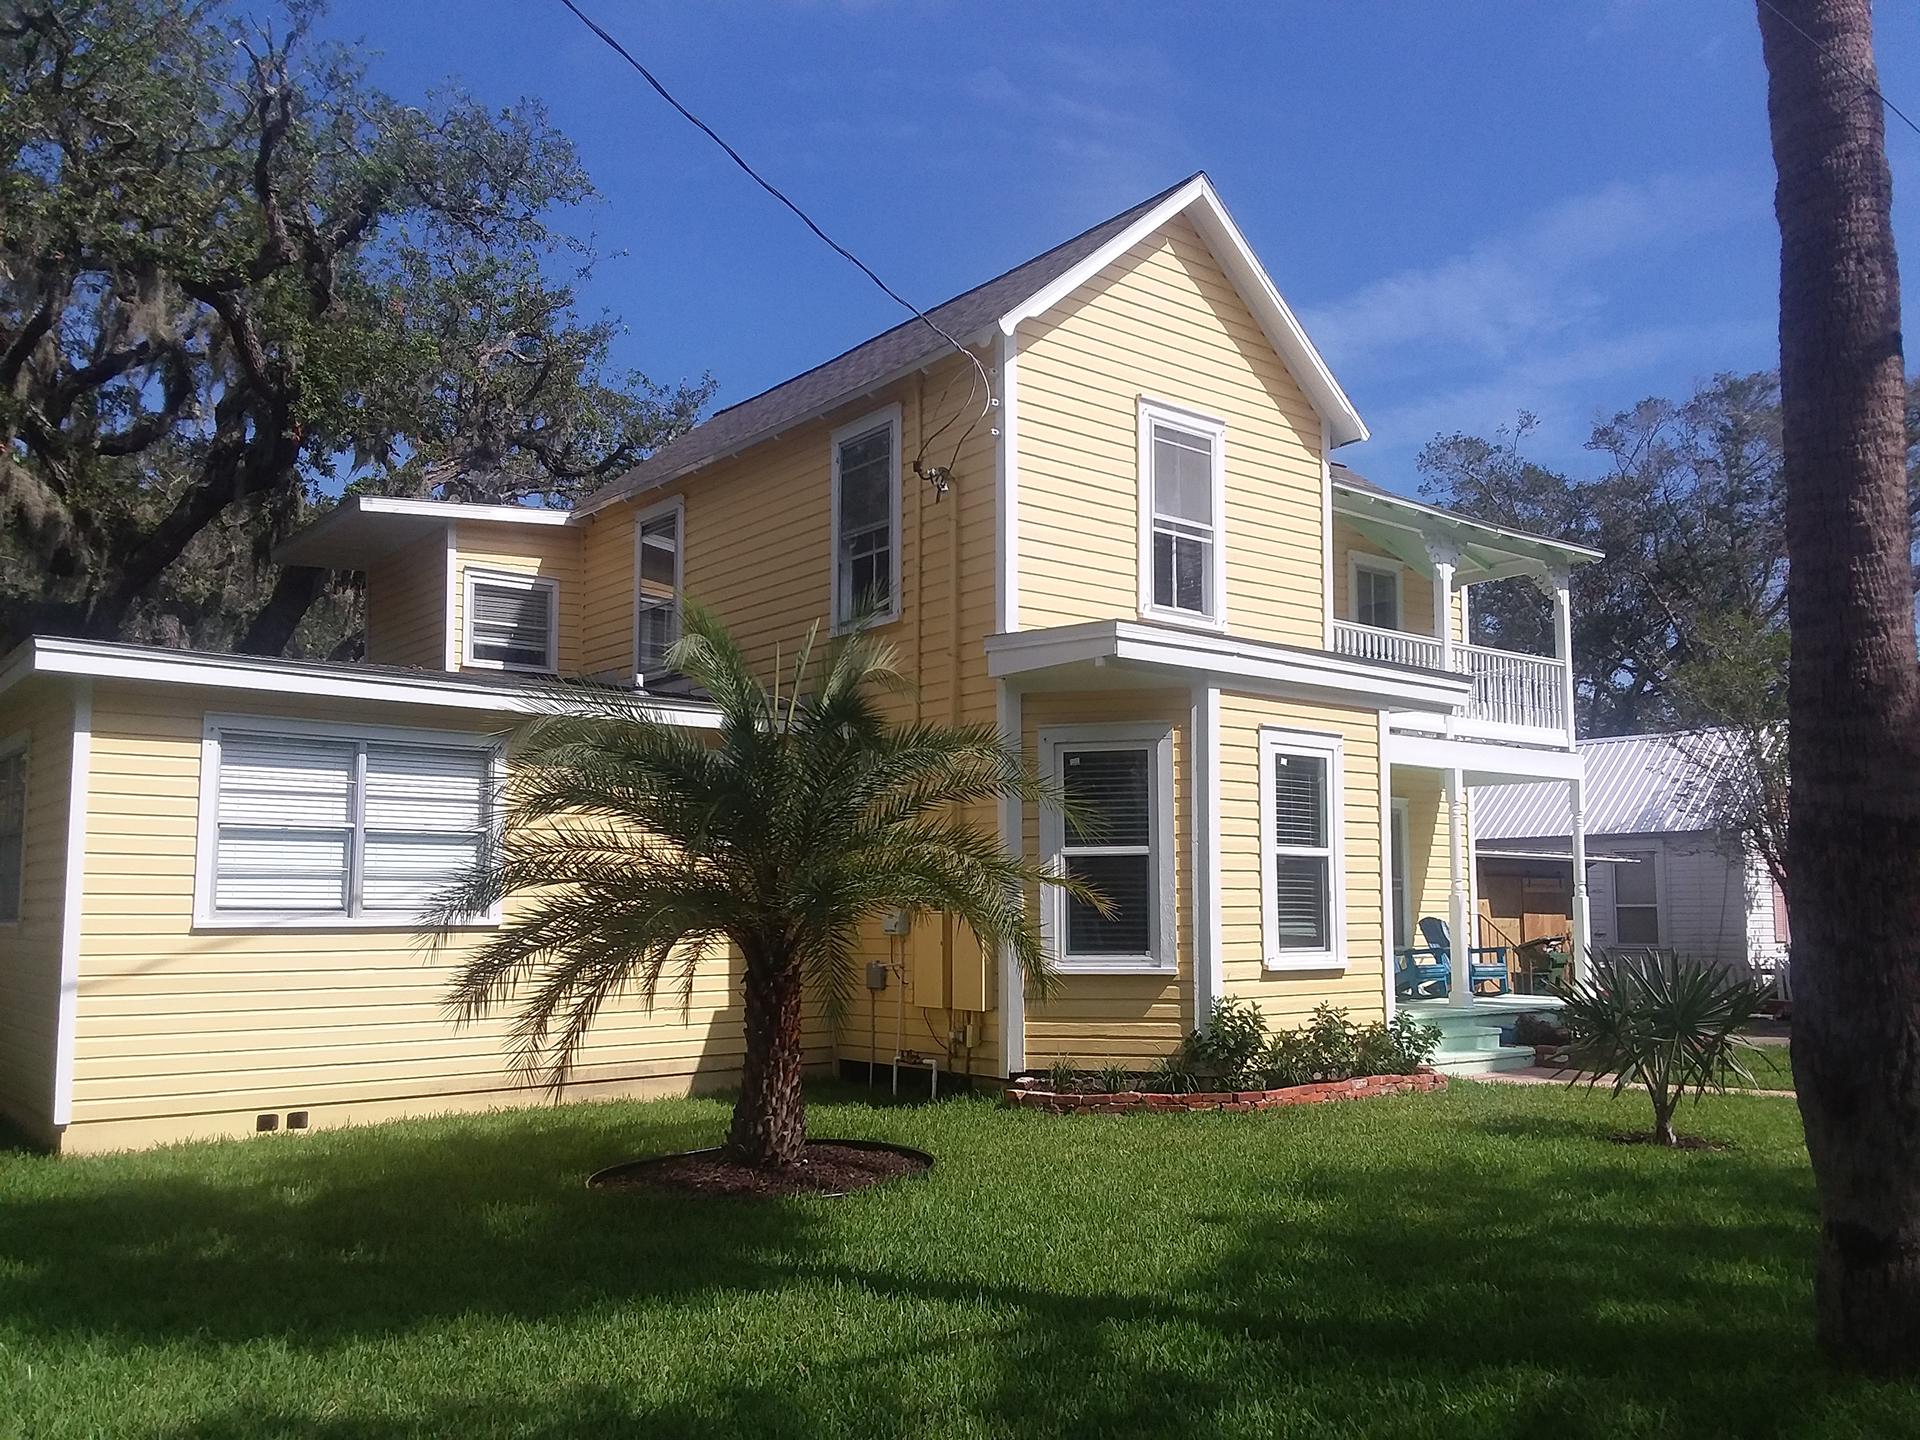 Sanchez-Home-American-Hammer-Construction-St-Augustine-FL-remodels-rebuilds-custom-homes-4